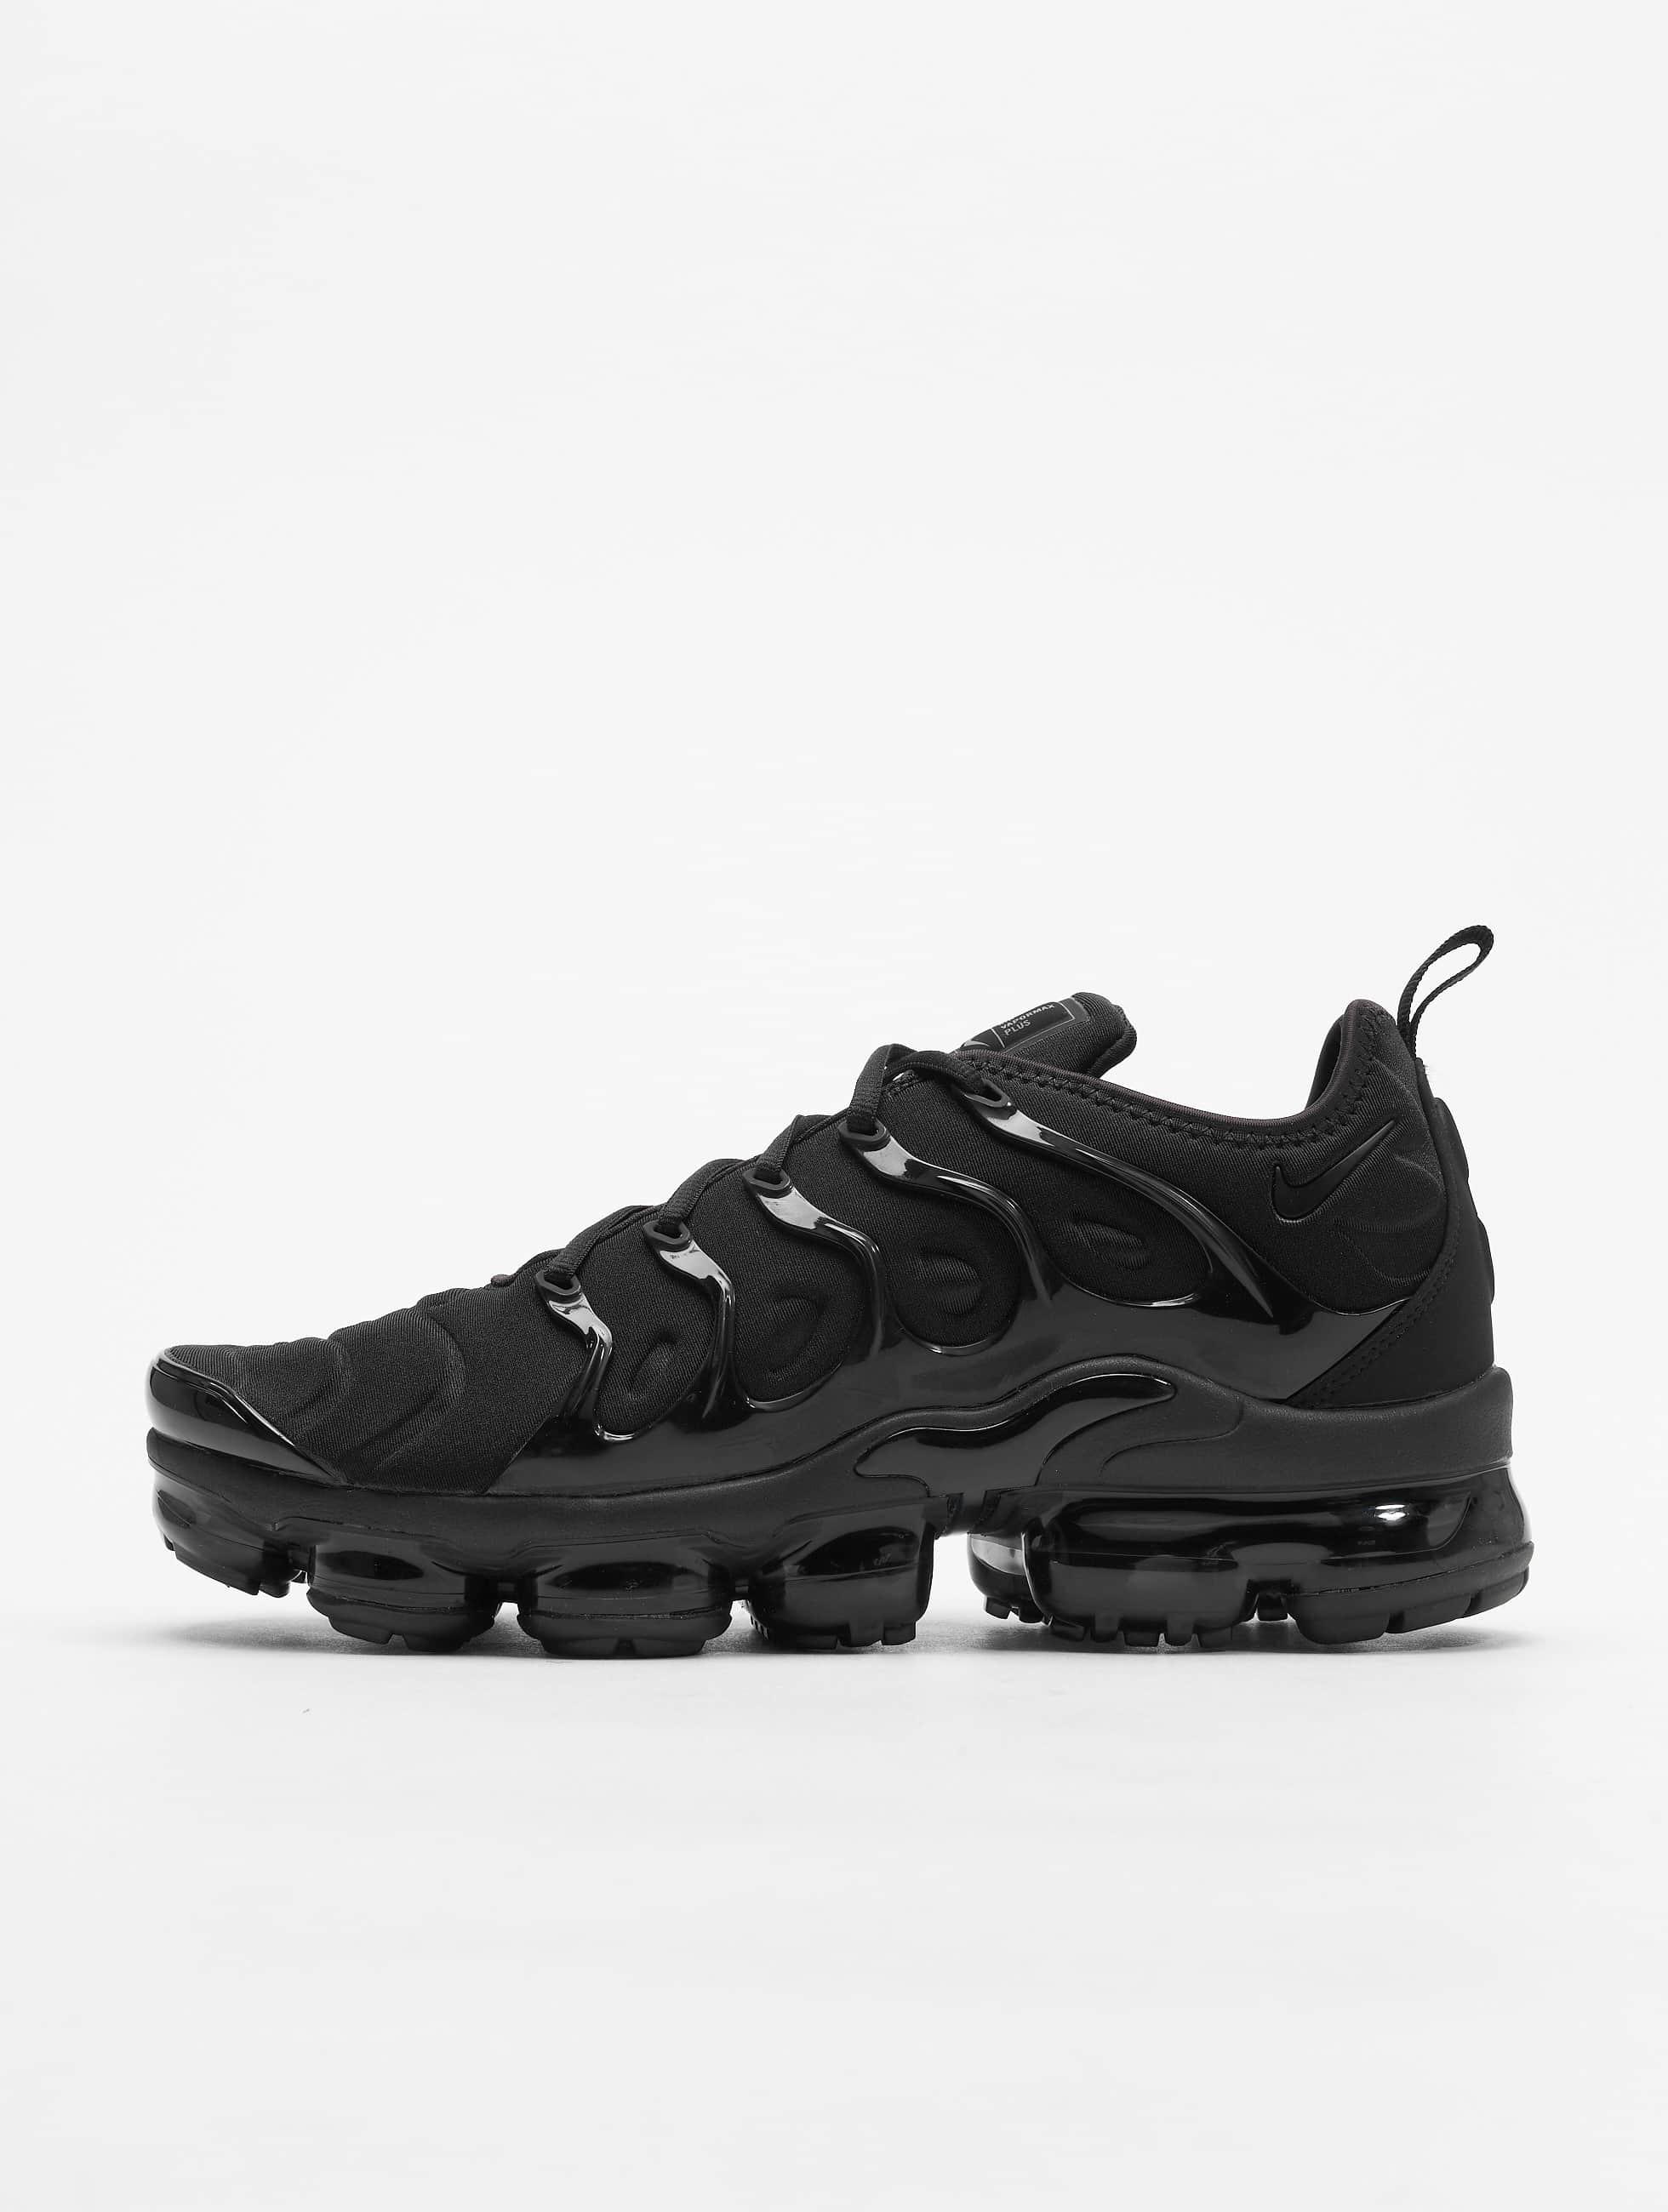 Nike Air Vapormax Plus Sneakers BlackBlackDark Grey